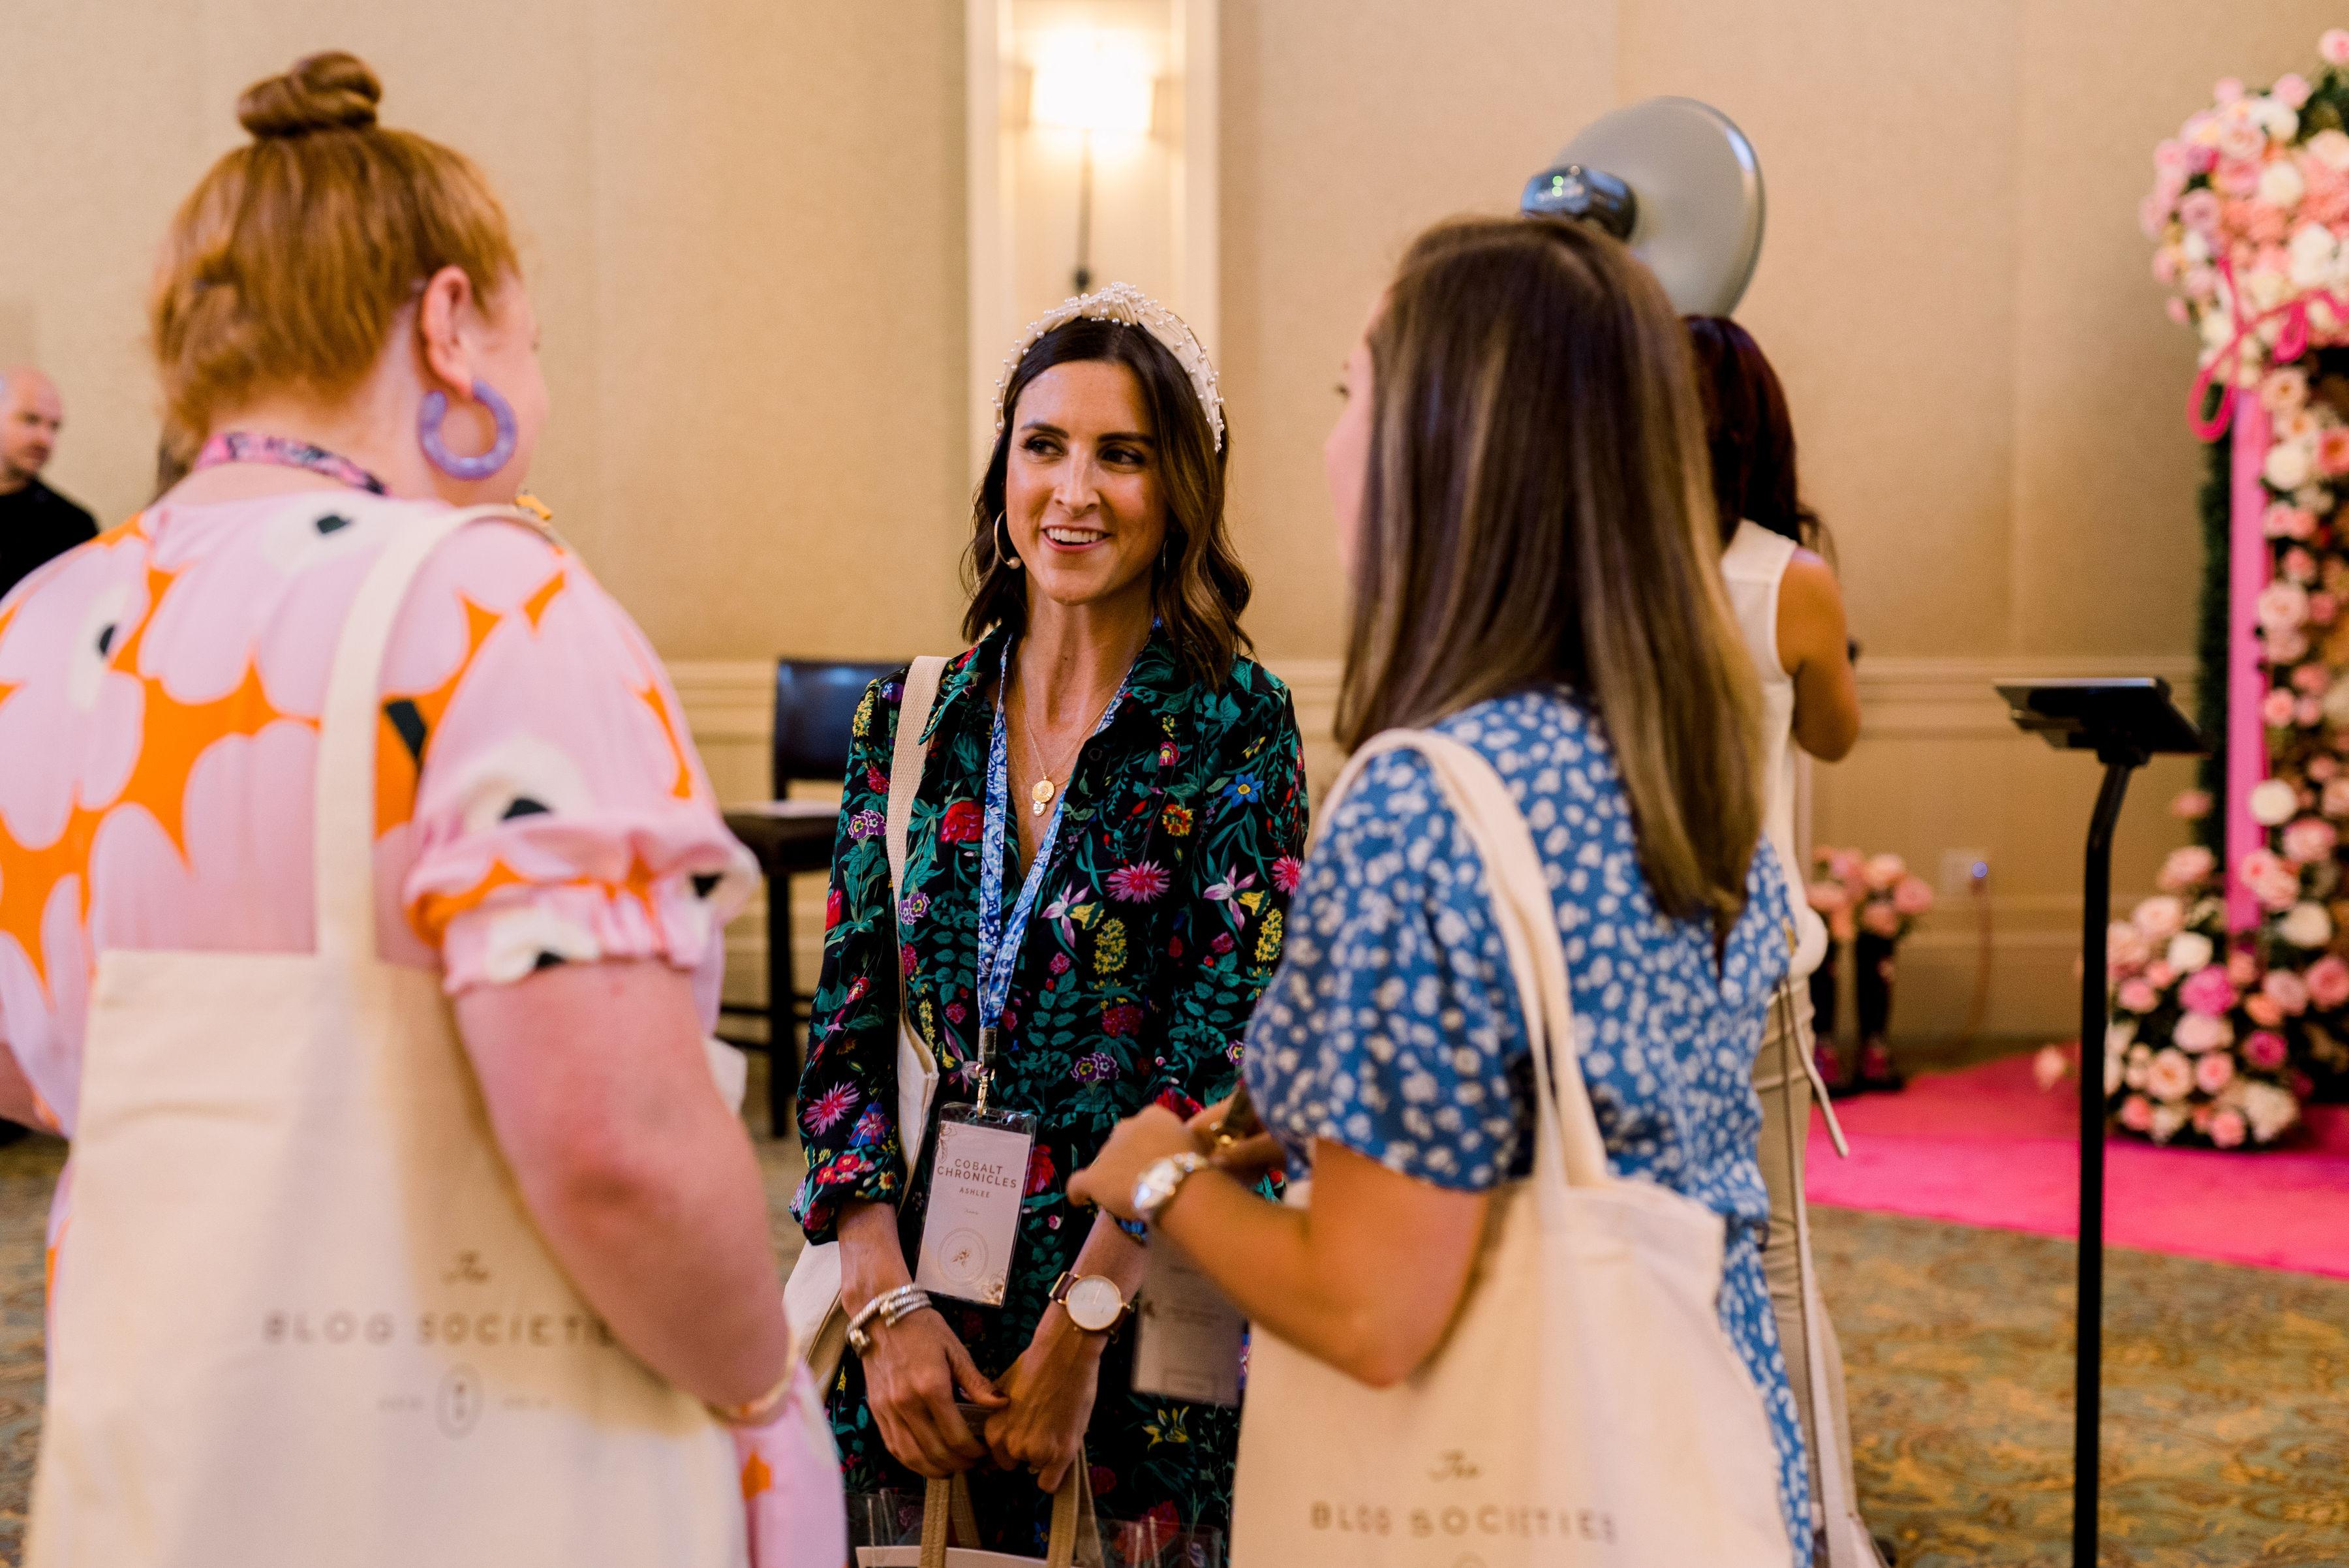 The Blog Societies Conference 2018 Recap | TBScon